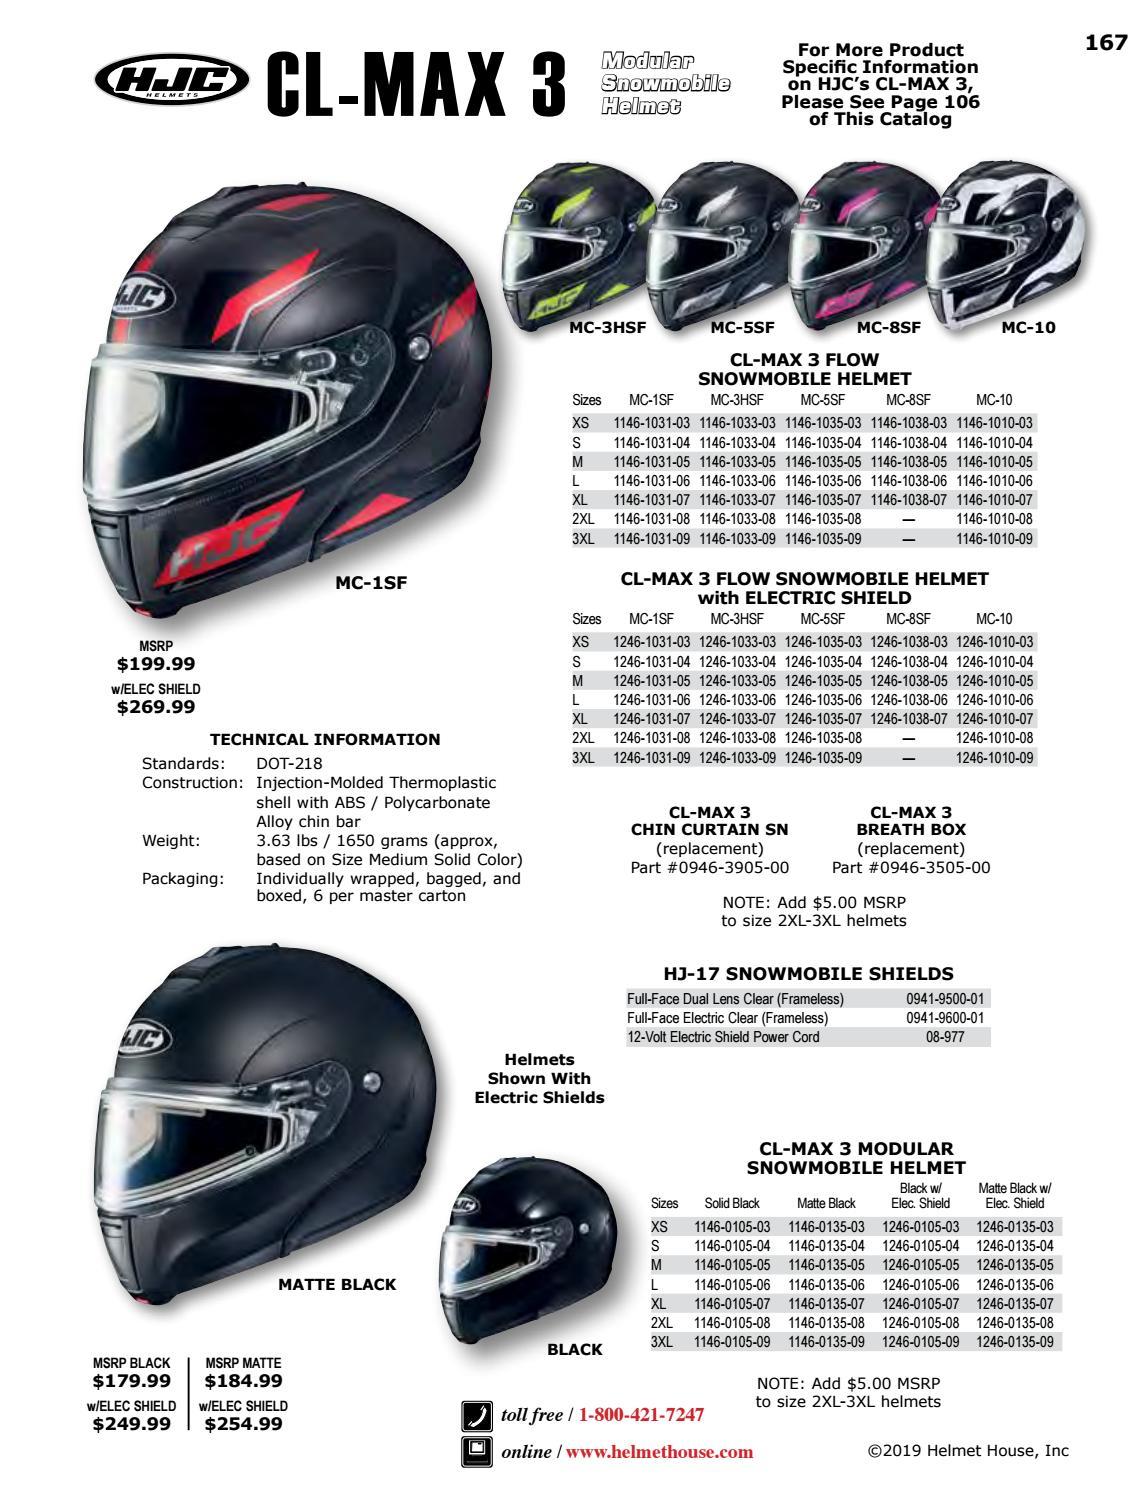 2019 helmet house full catalog by helmet house inc issuu